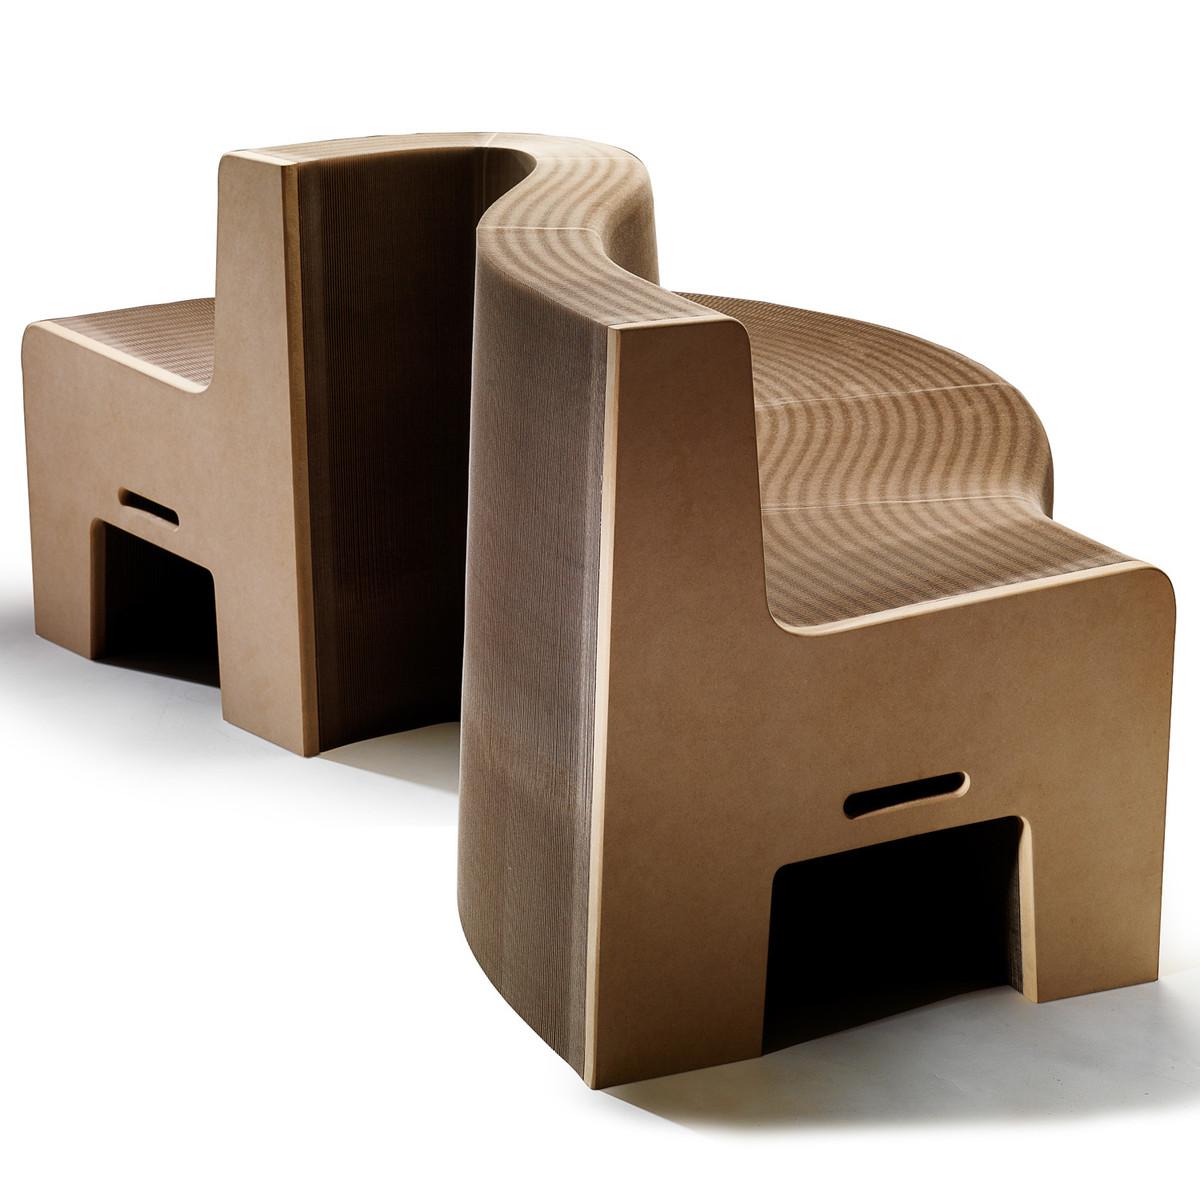 Carton et mobilier design architecture interieure conseil - Mobilier carton design ...